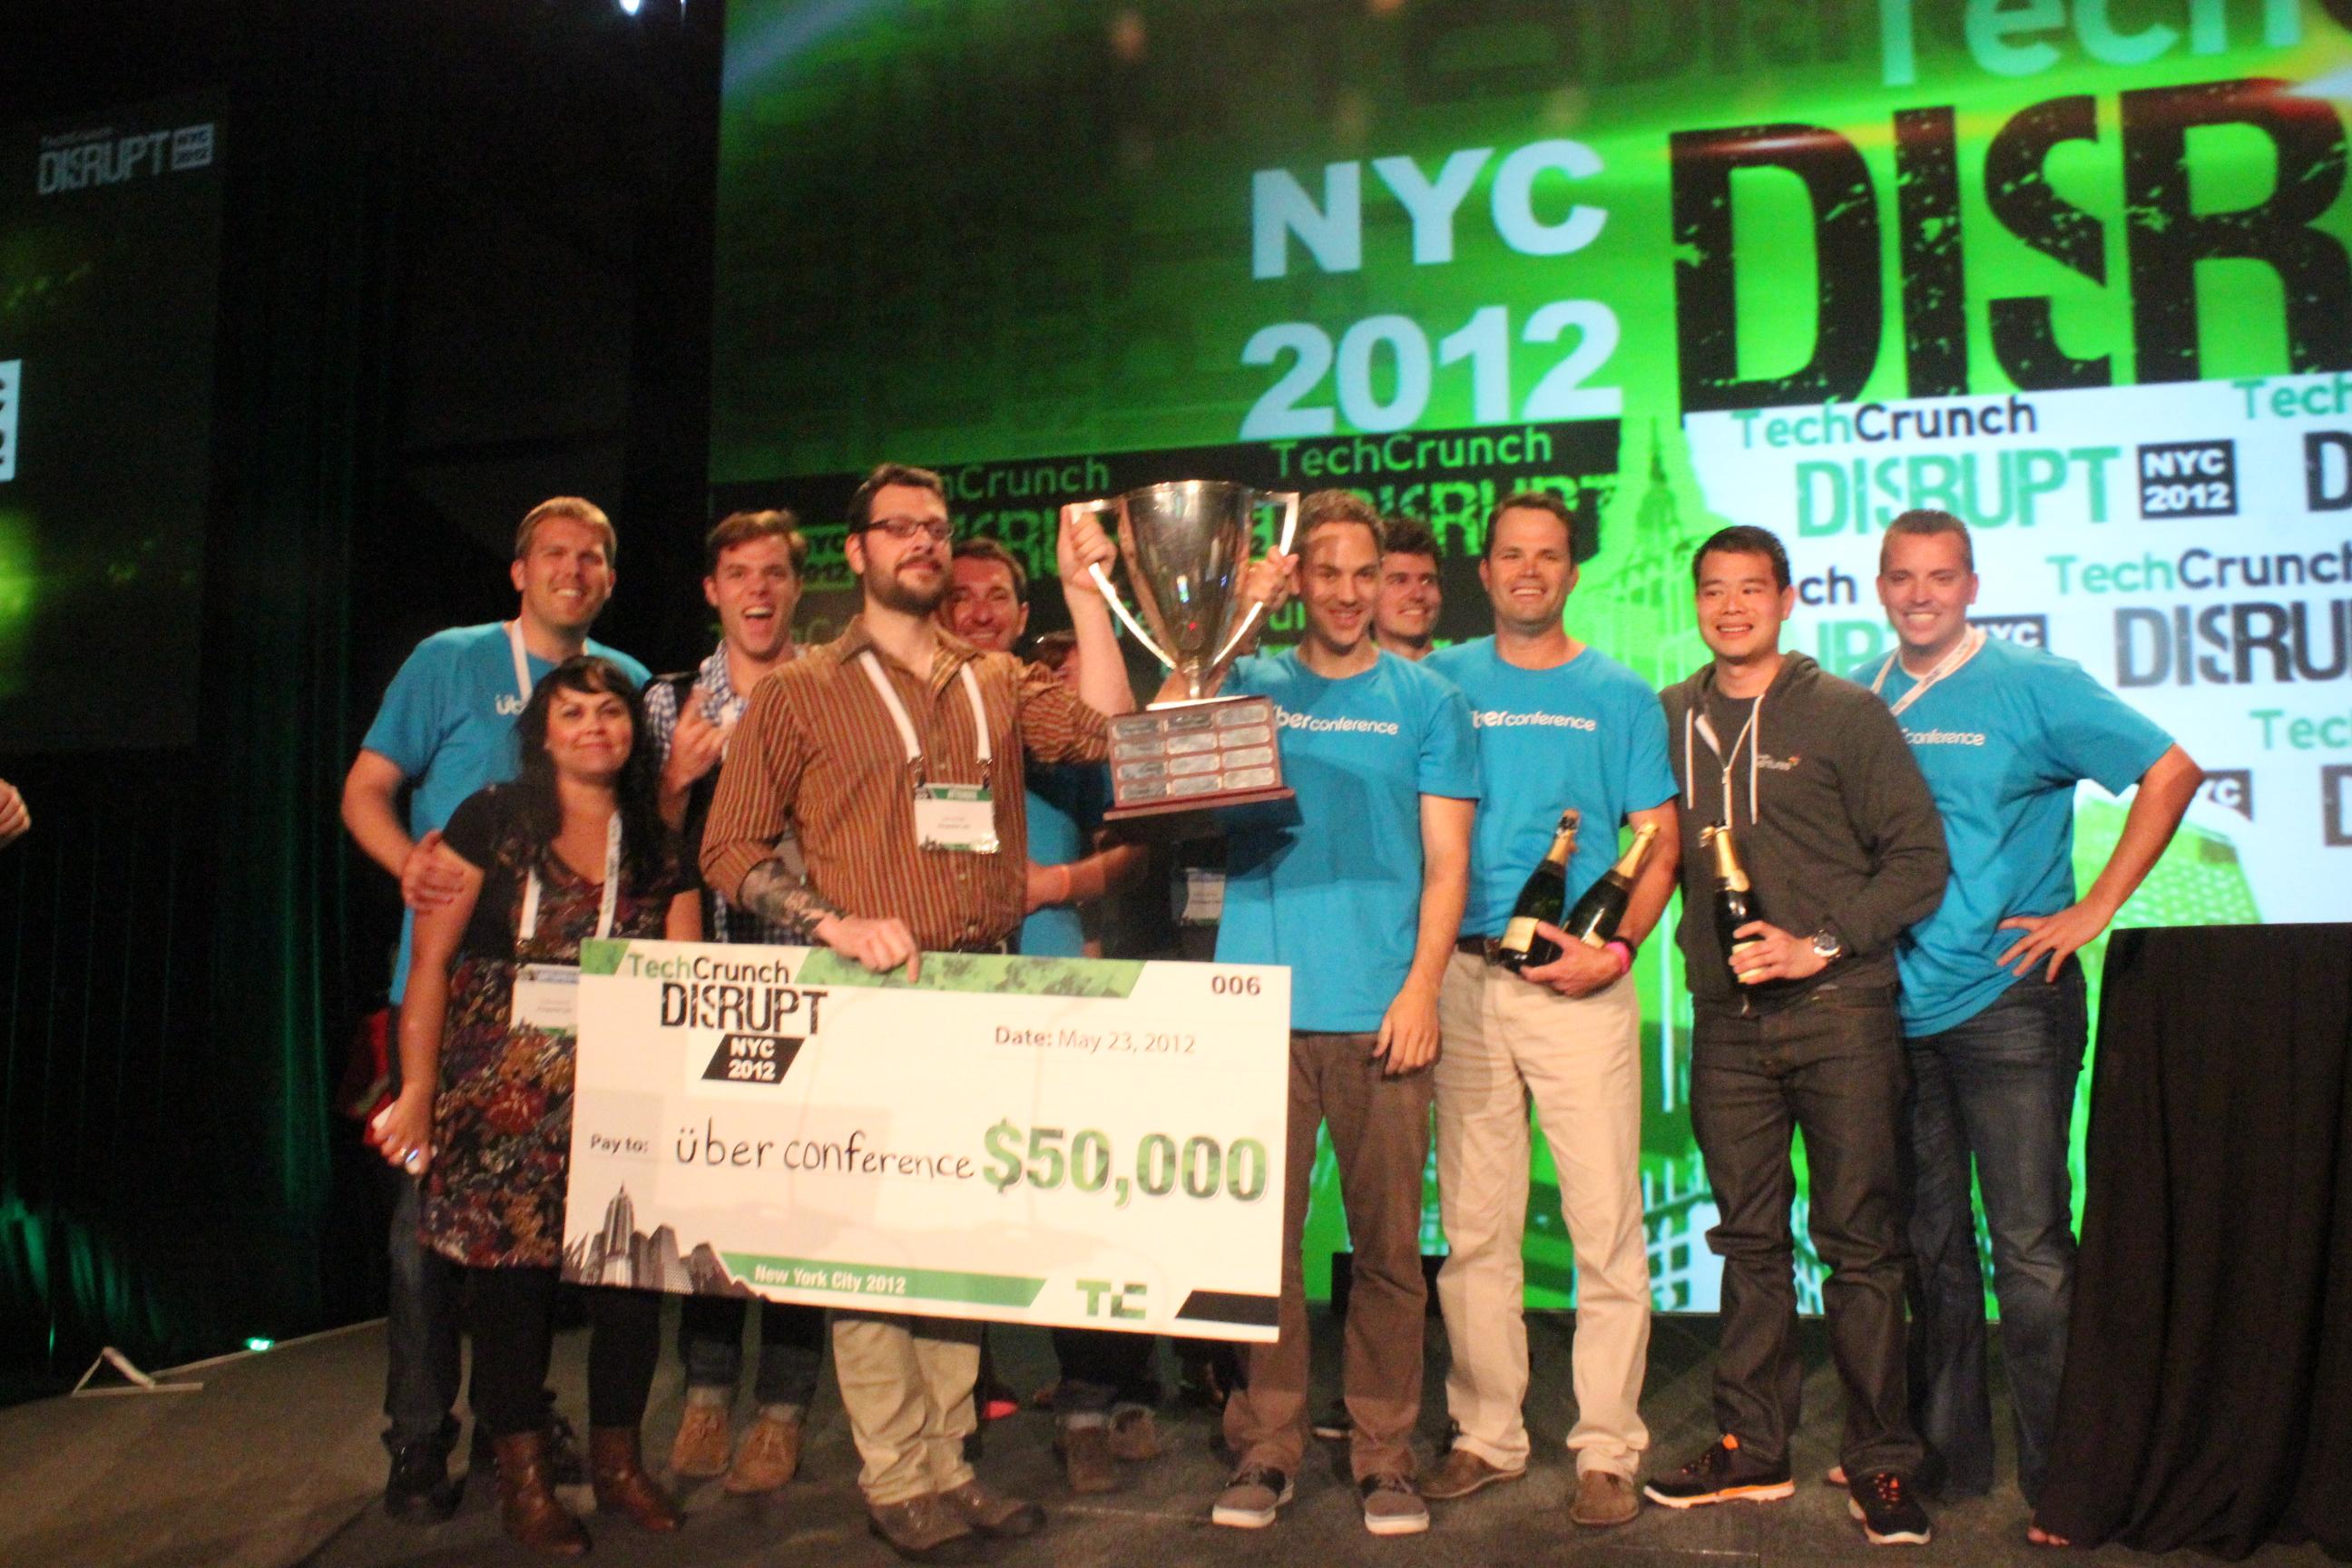 UberConference الفريق الفائز مع الكأس و شيك الجائزة